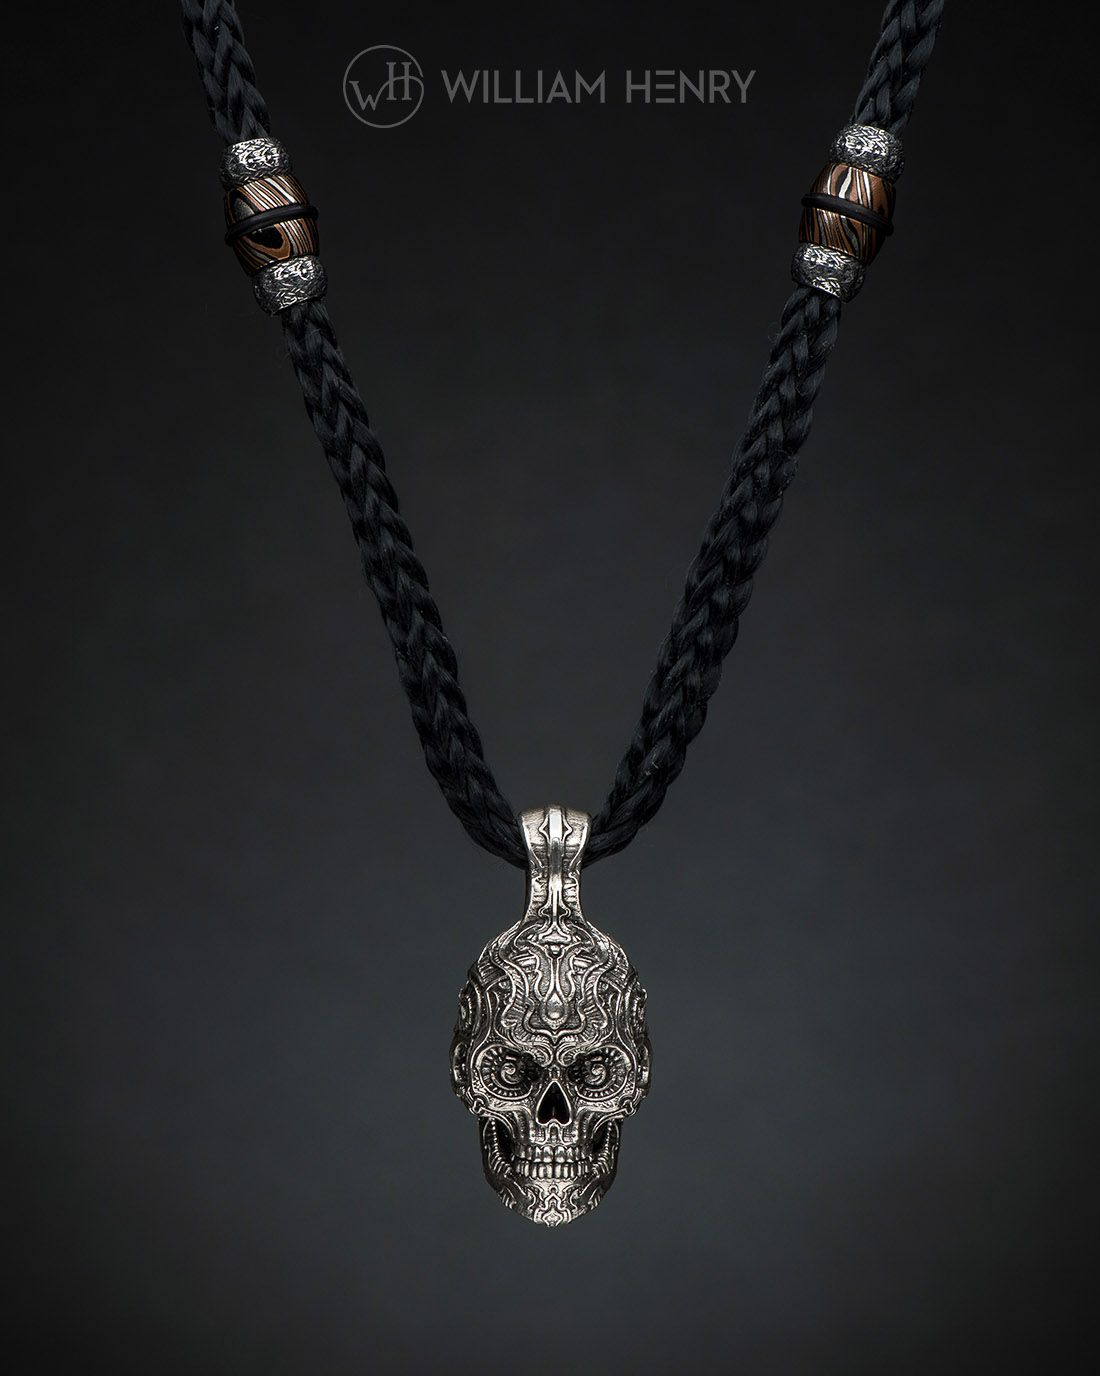 Badass silver skull pendant on kevlar cord with insets in sterling badass silver skull pendant on kevlar cord with insets in sterling silver and mokume gane mozeypictures Image collections